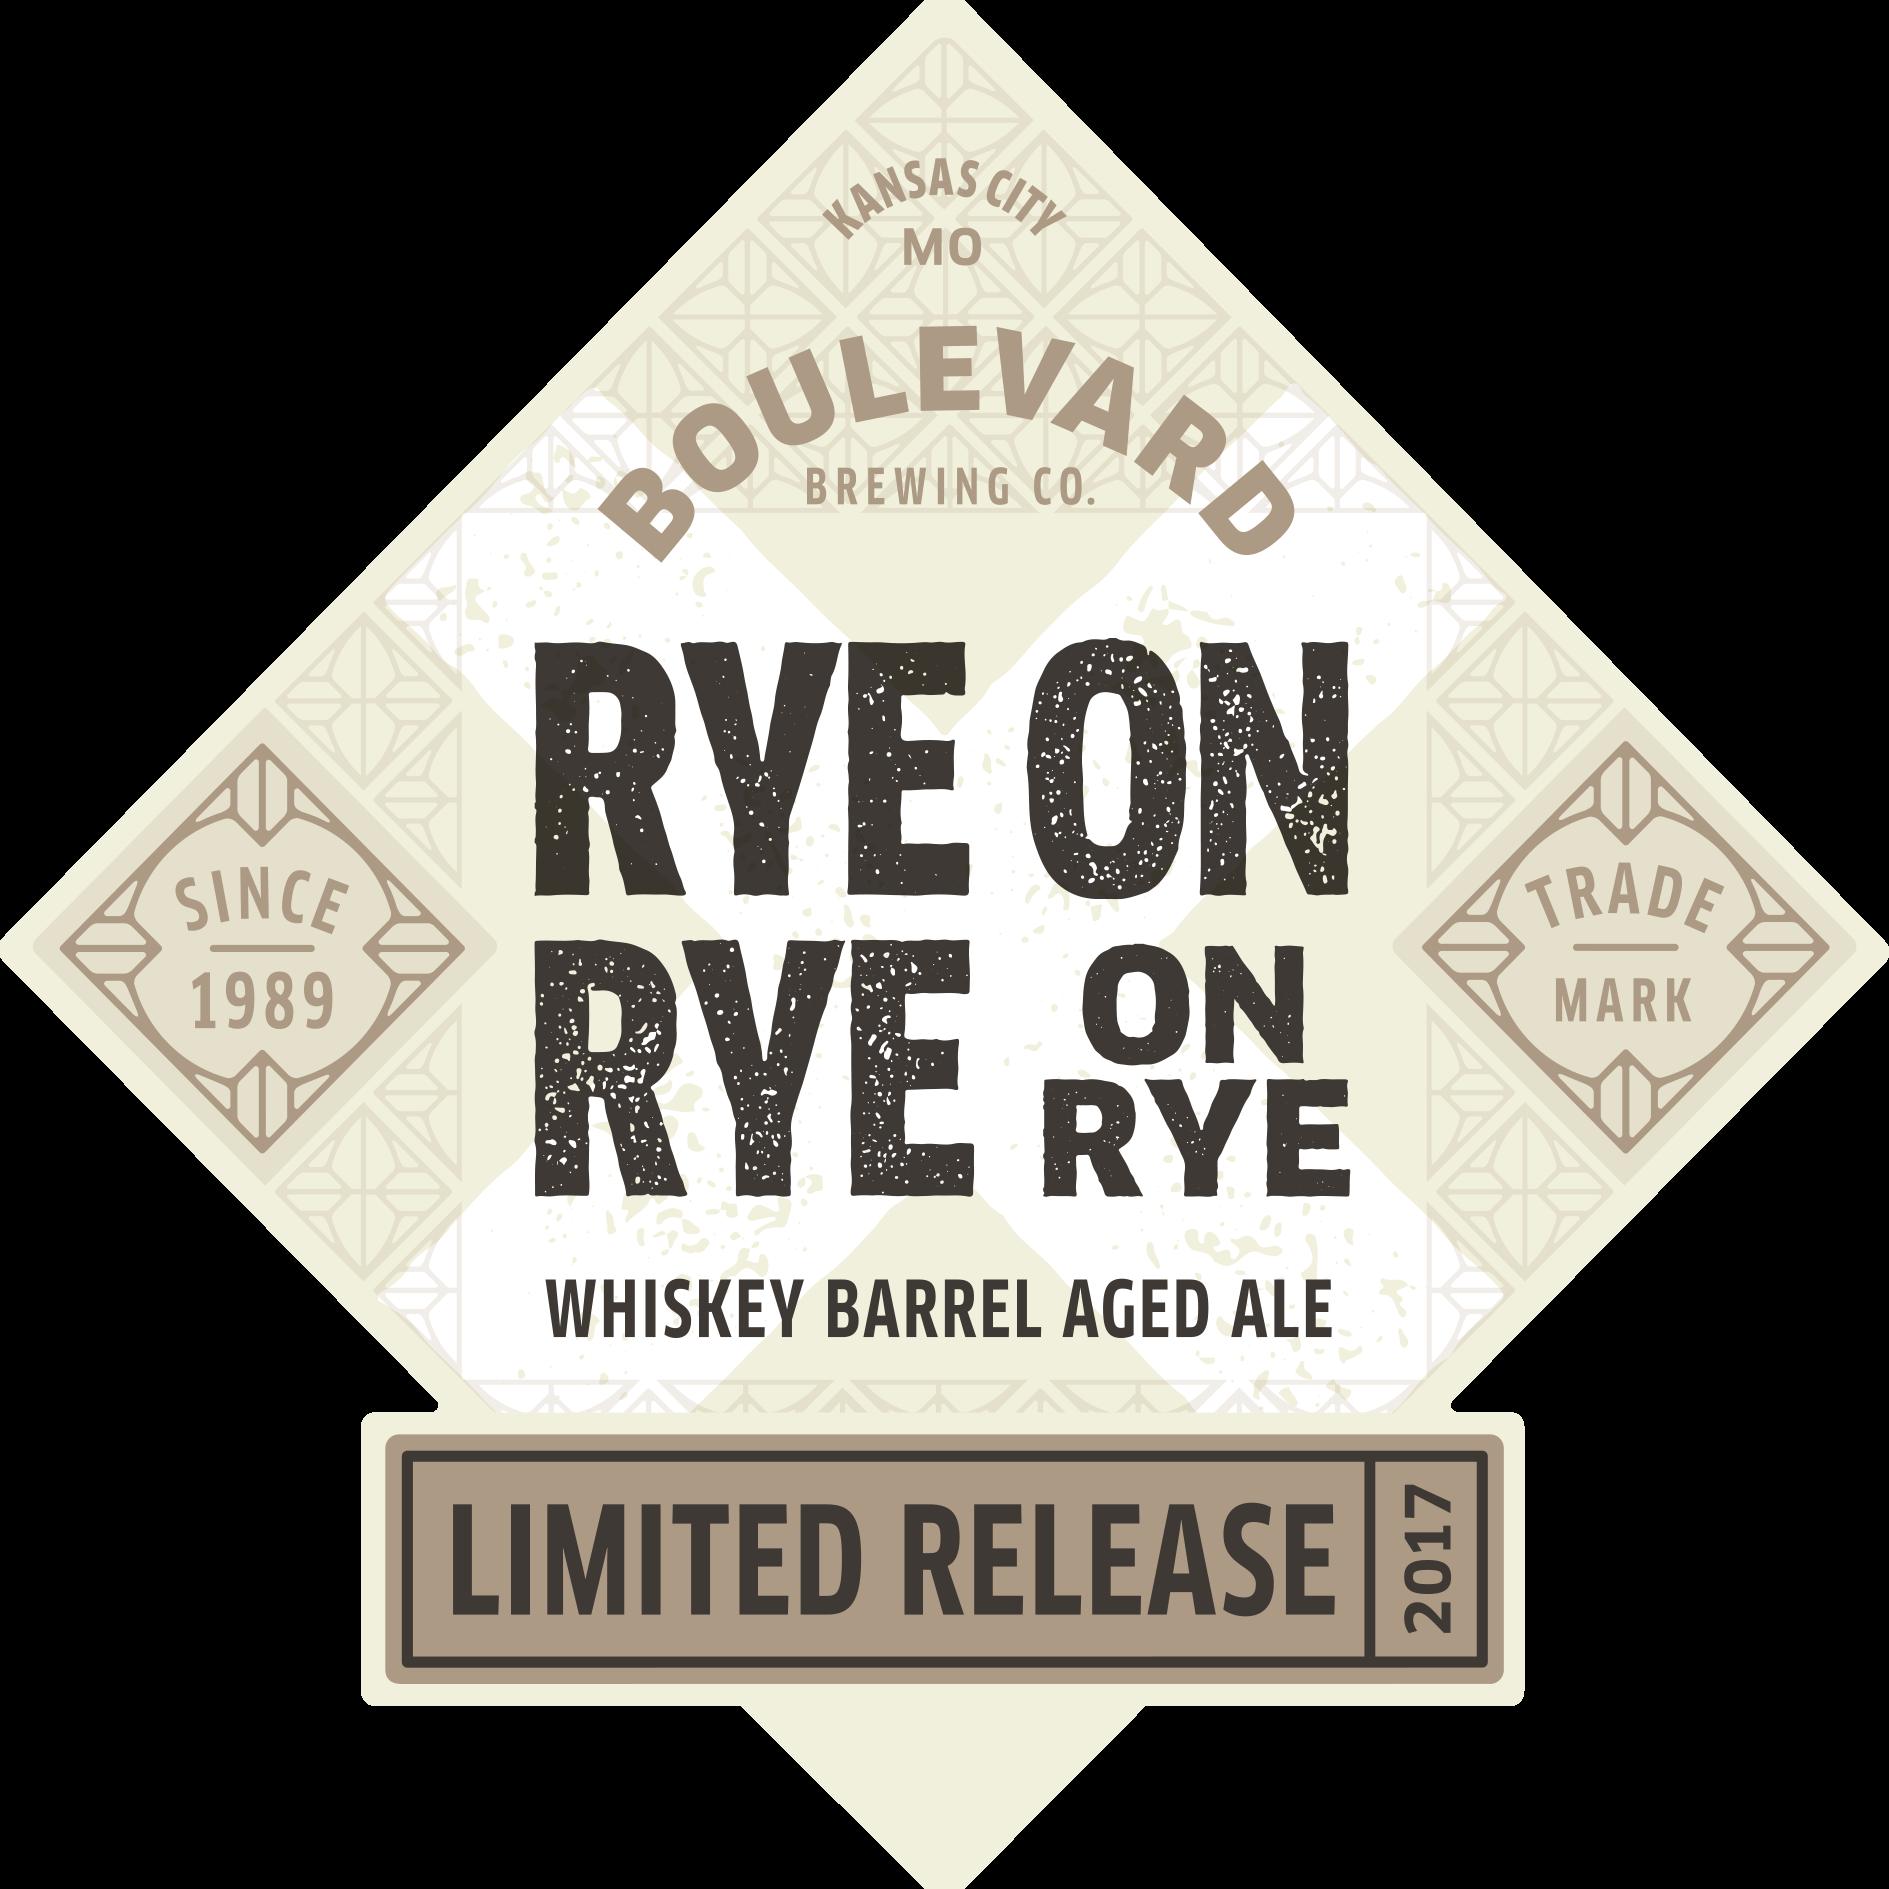 Rye on Rye on Rye